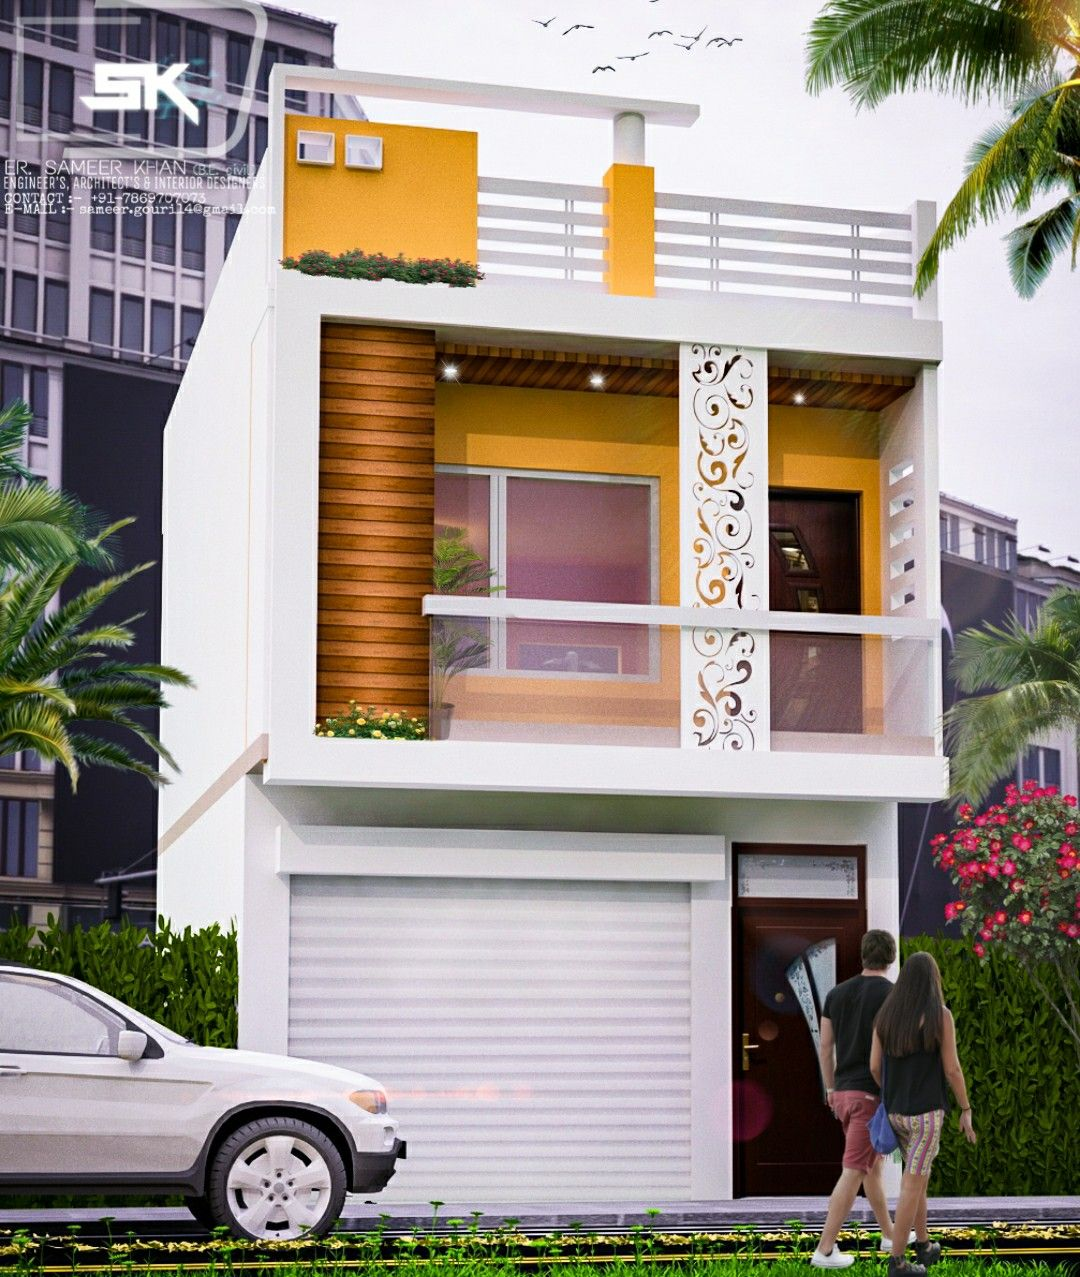 indian small house exterior design Home Design Download Indian Small House Exterior Design Gif